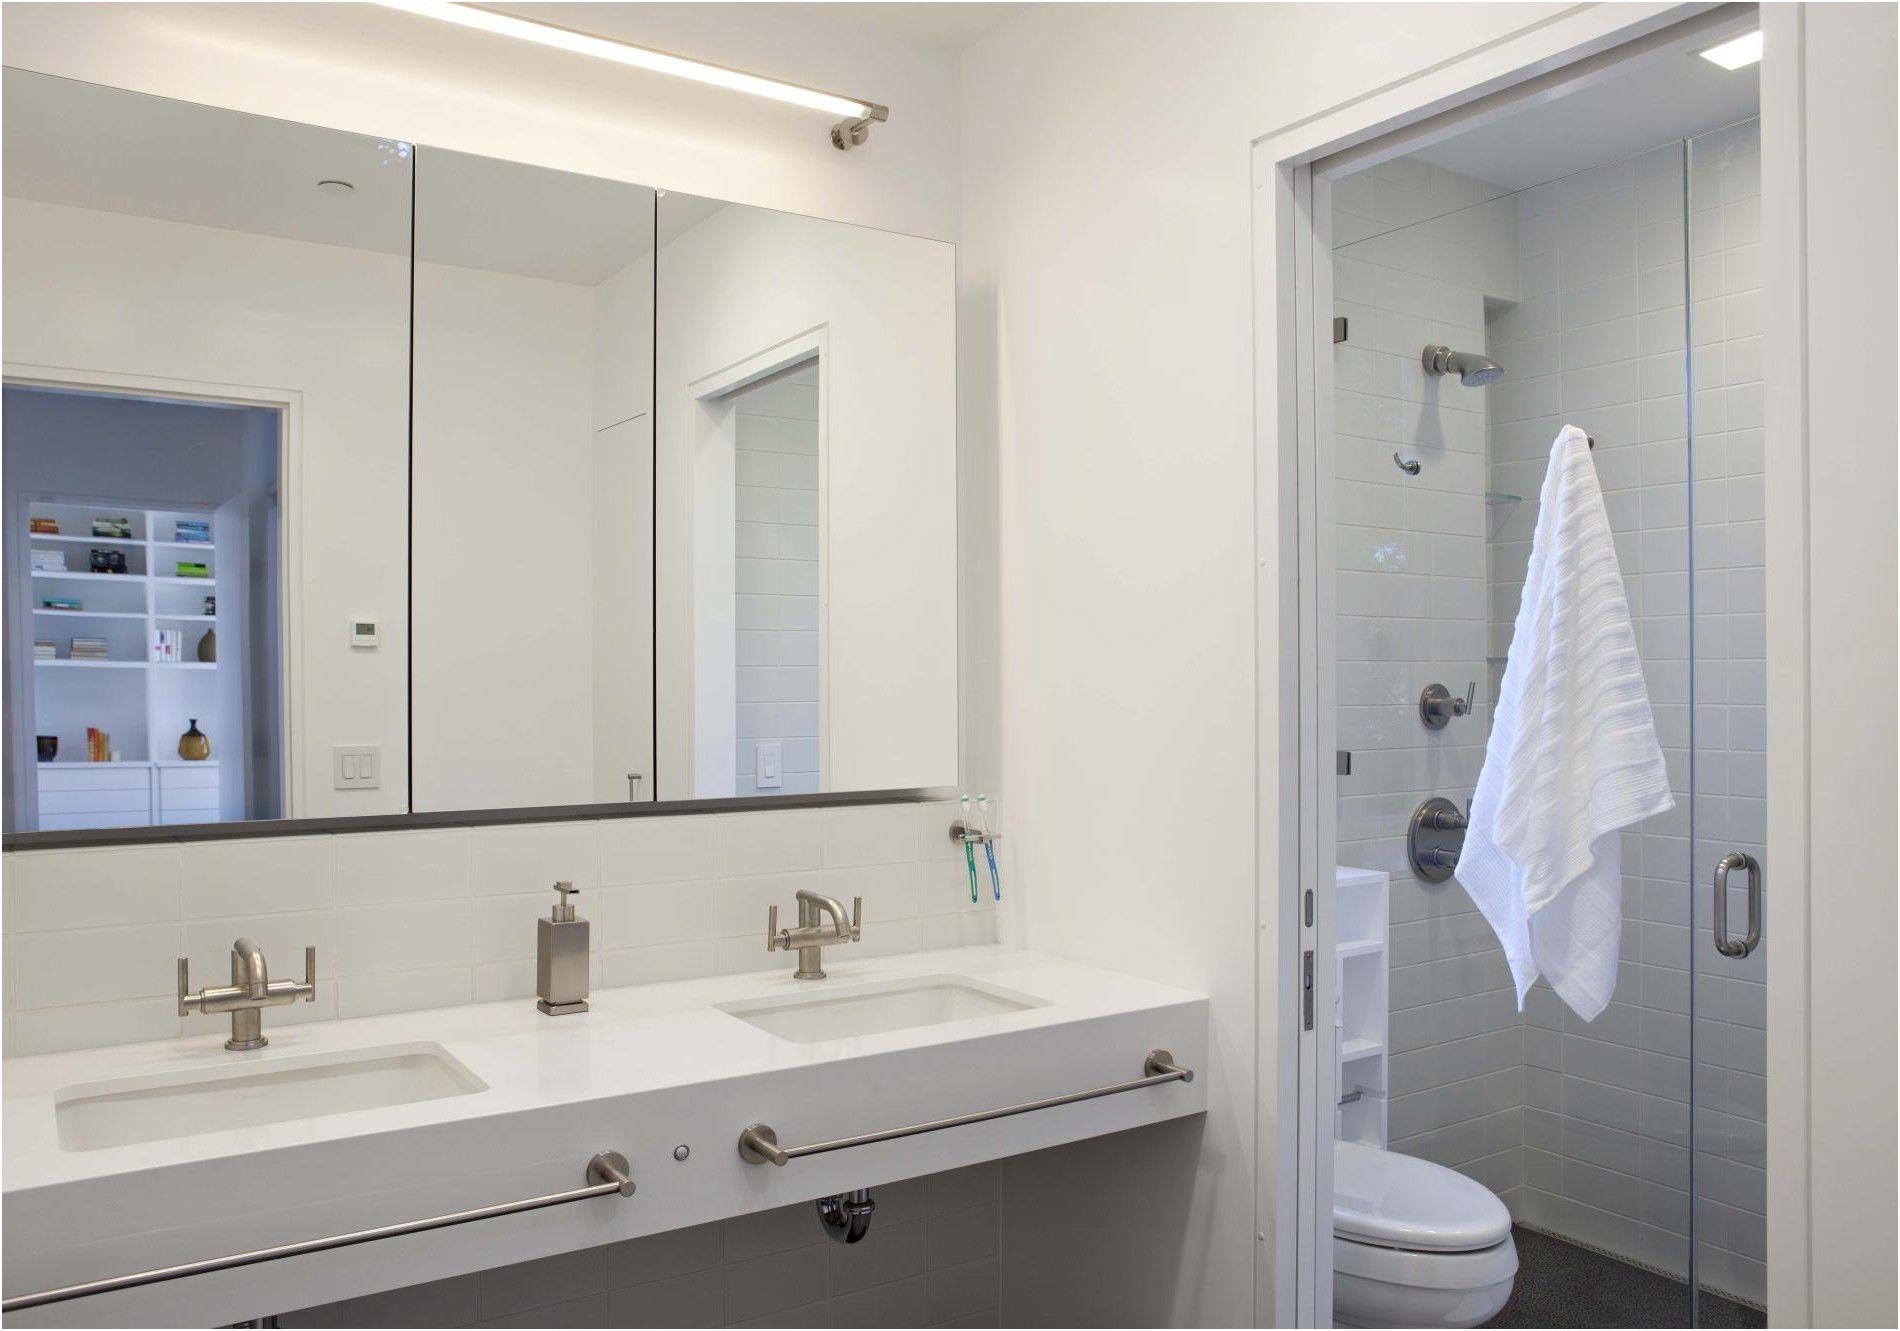 Cool Bathroom Lights Modern Lighting Image On Decorating